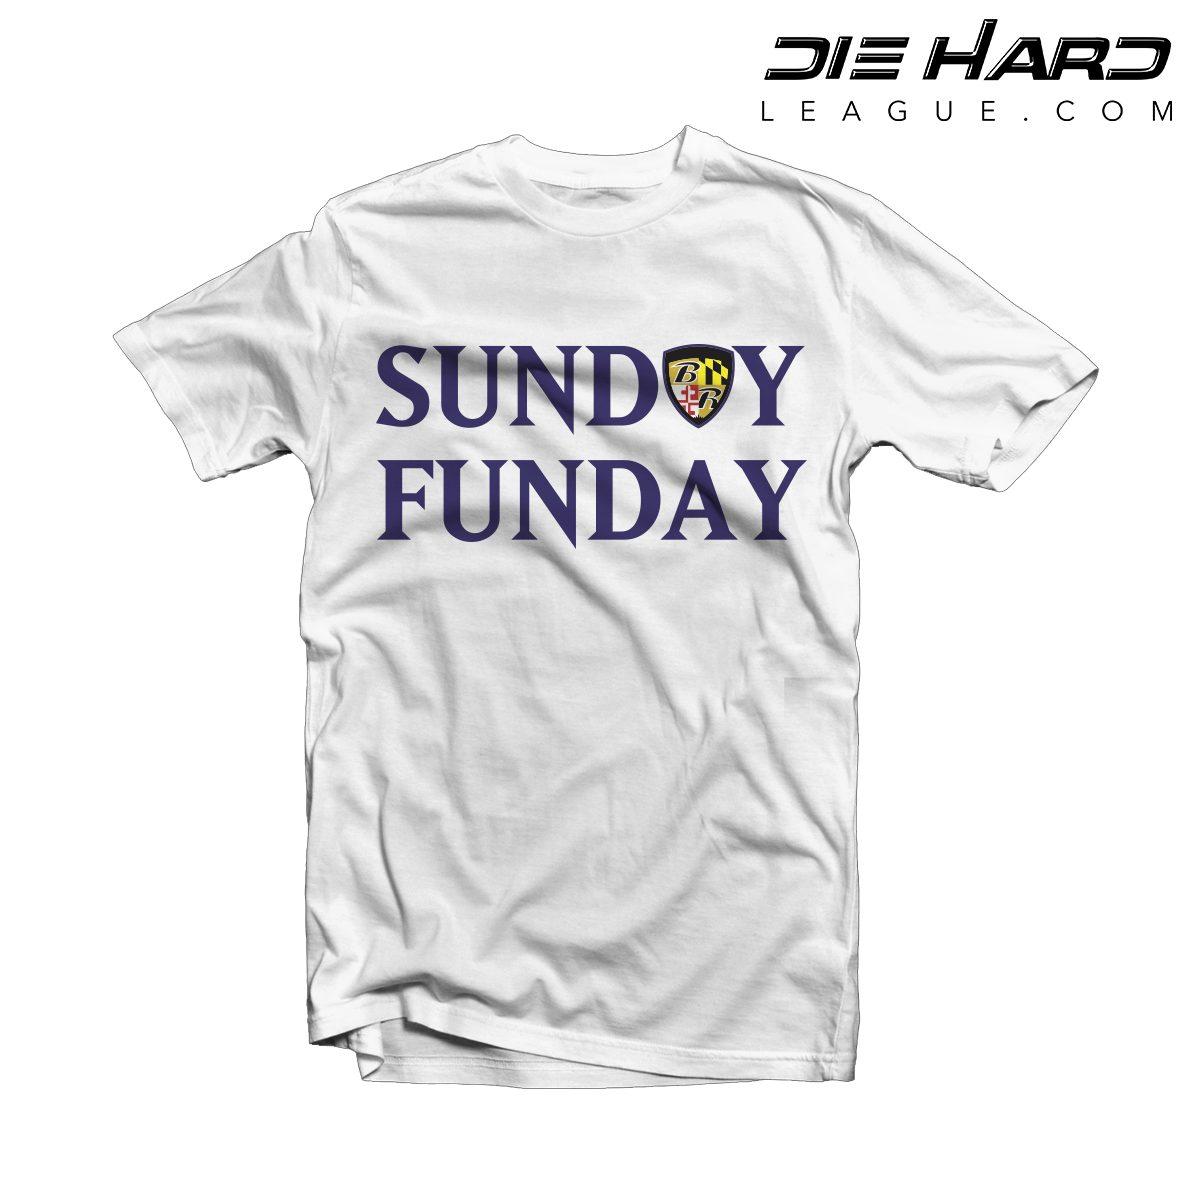 54fdfa86cc7cd Shop. Home/Baltimore Ravens/Ravens Shirts/Baltimore Ravens Shirts – Sunday  Funday White Tee